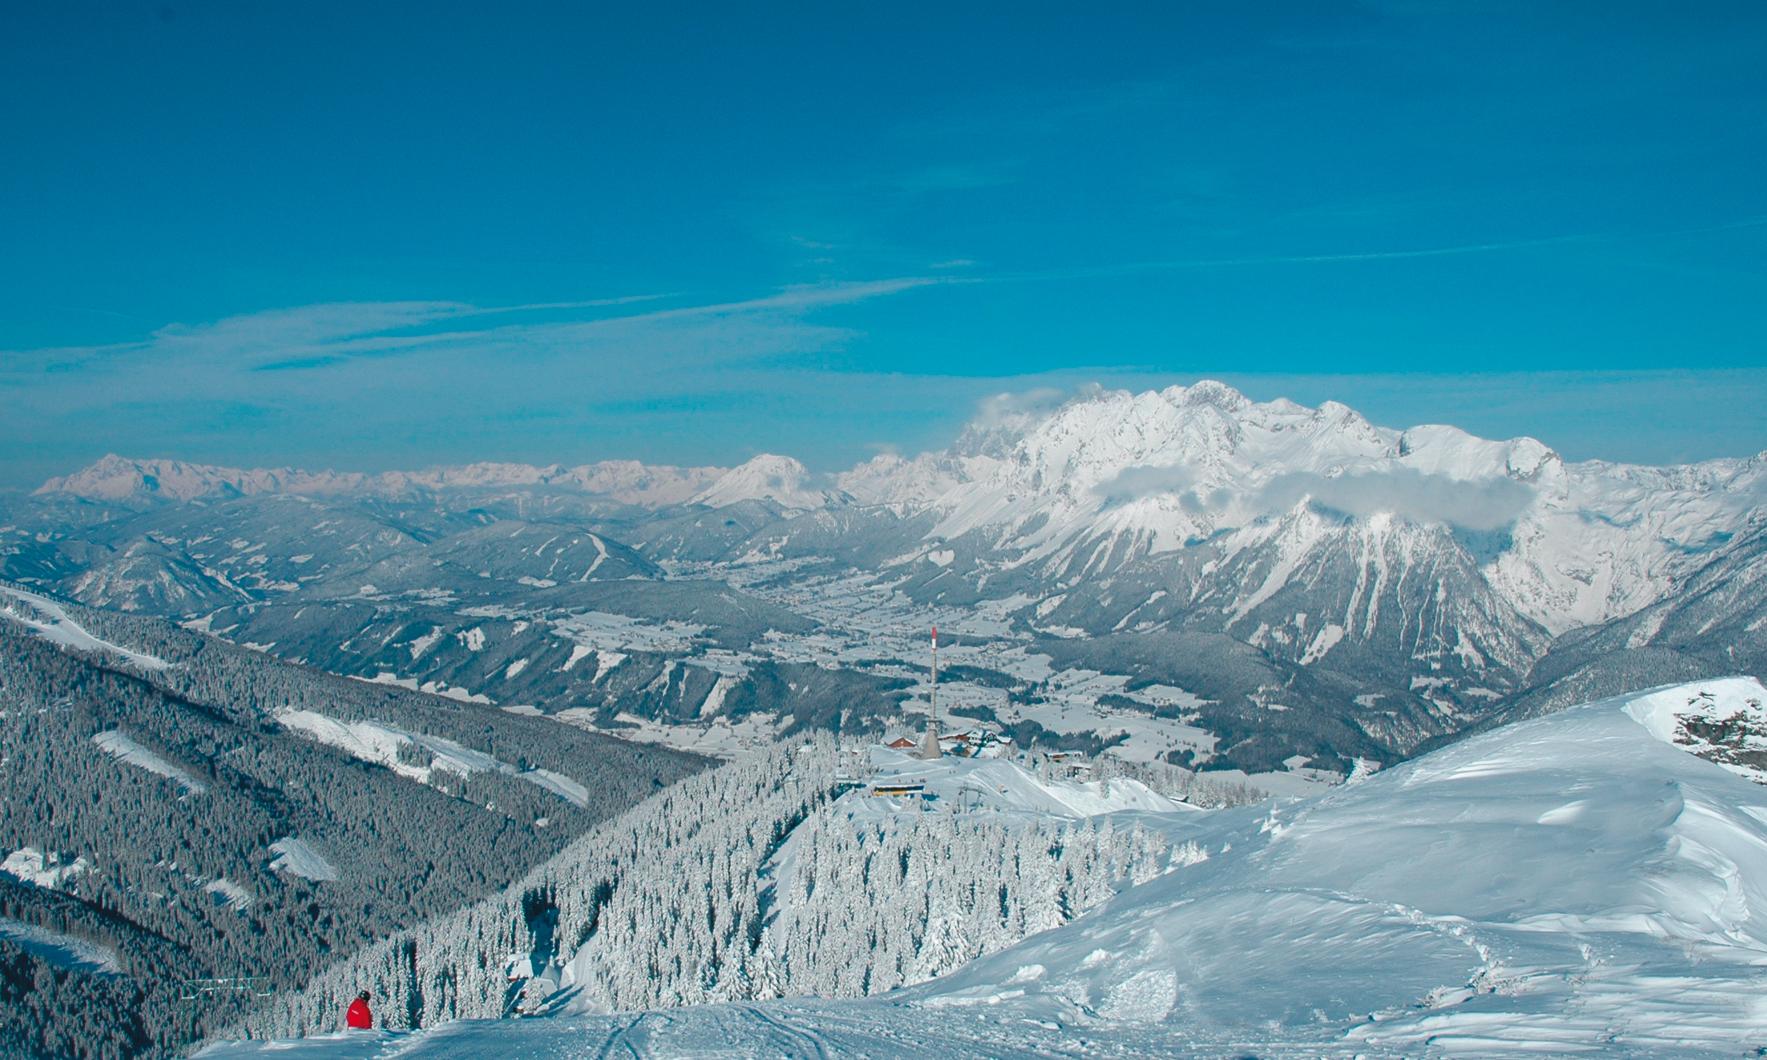 Skigebiet hauser kaibling ski amade live webcam